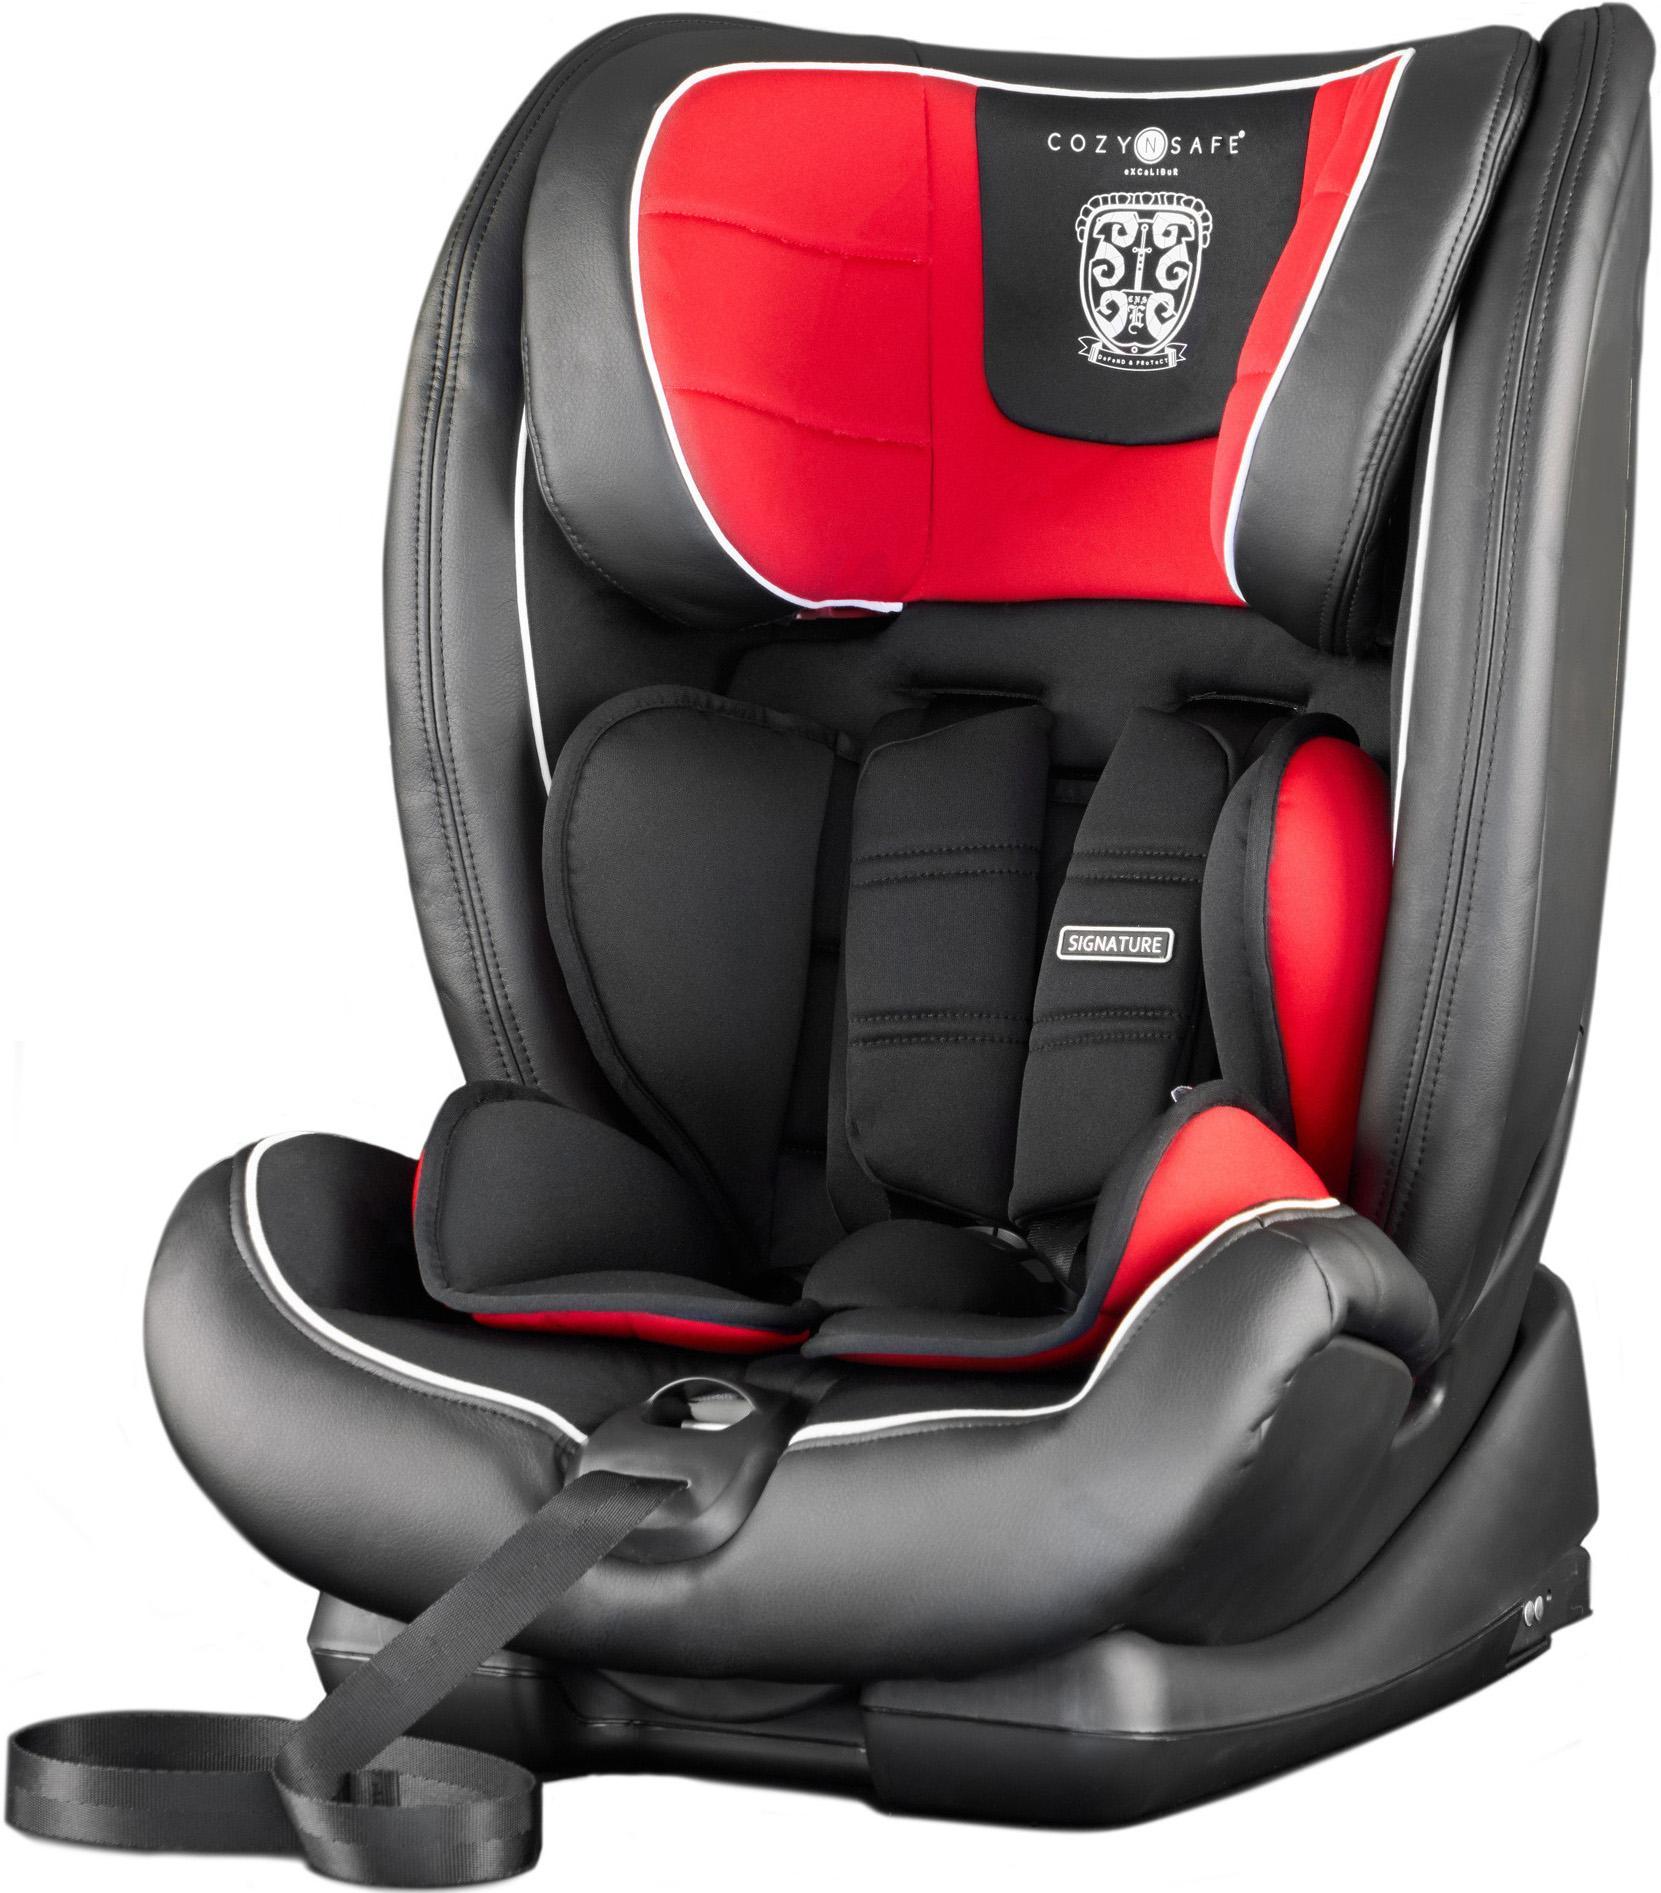 Cozy N Safe Excalibur Car Seat